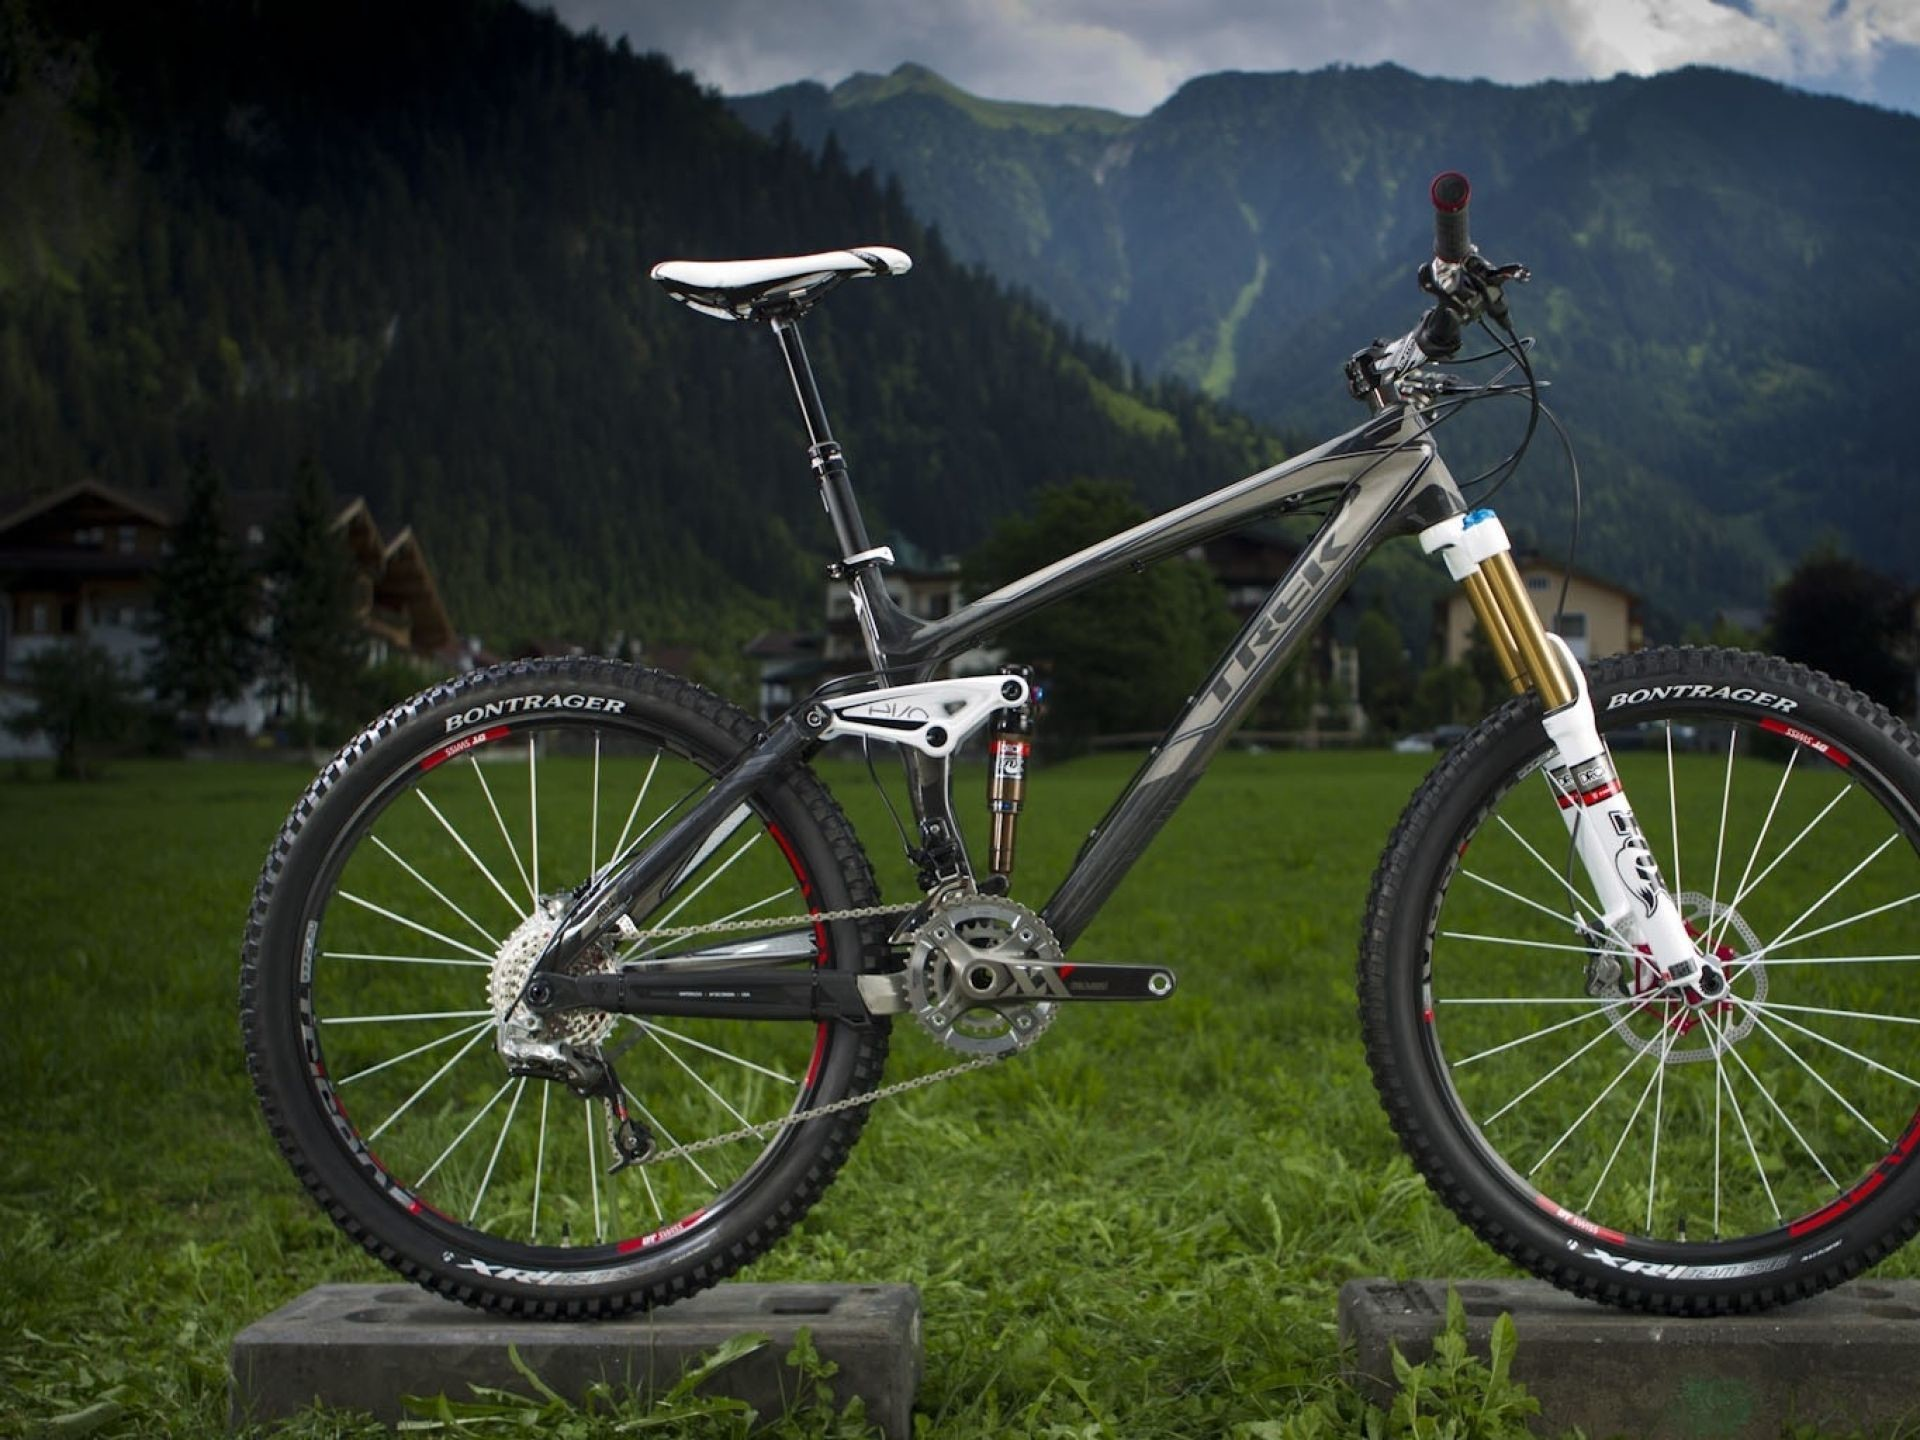 Res: 1920x1440, bicycles trek mtb trek bike trek fuel ex 1536x1024 wallpaper Wallpaper HD